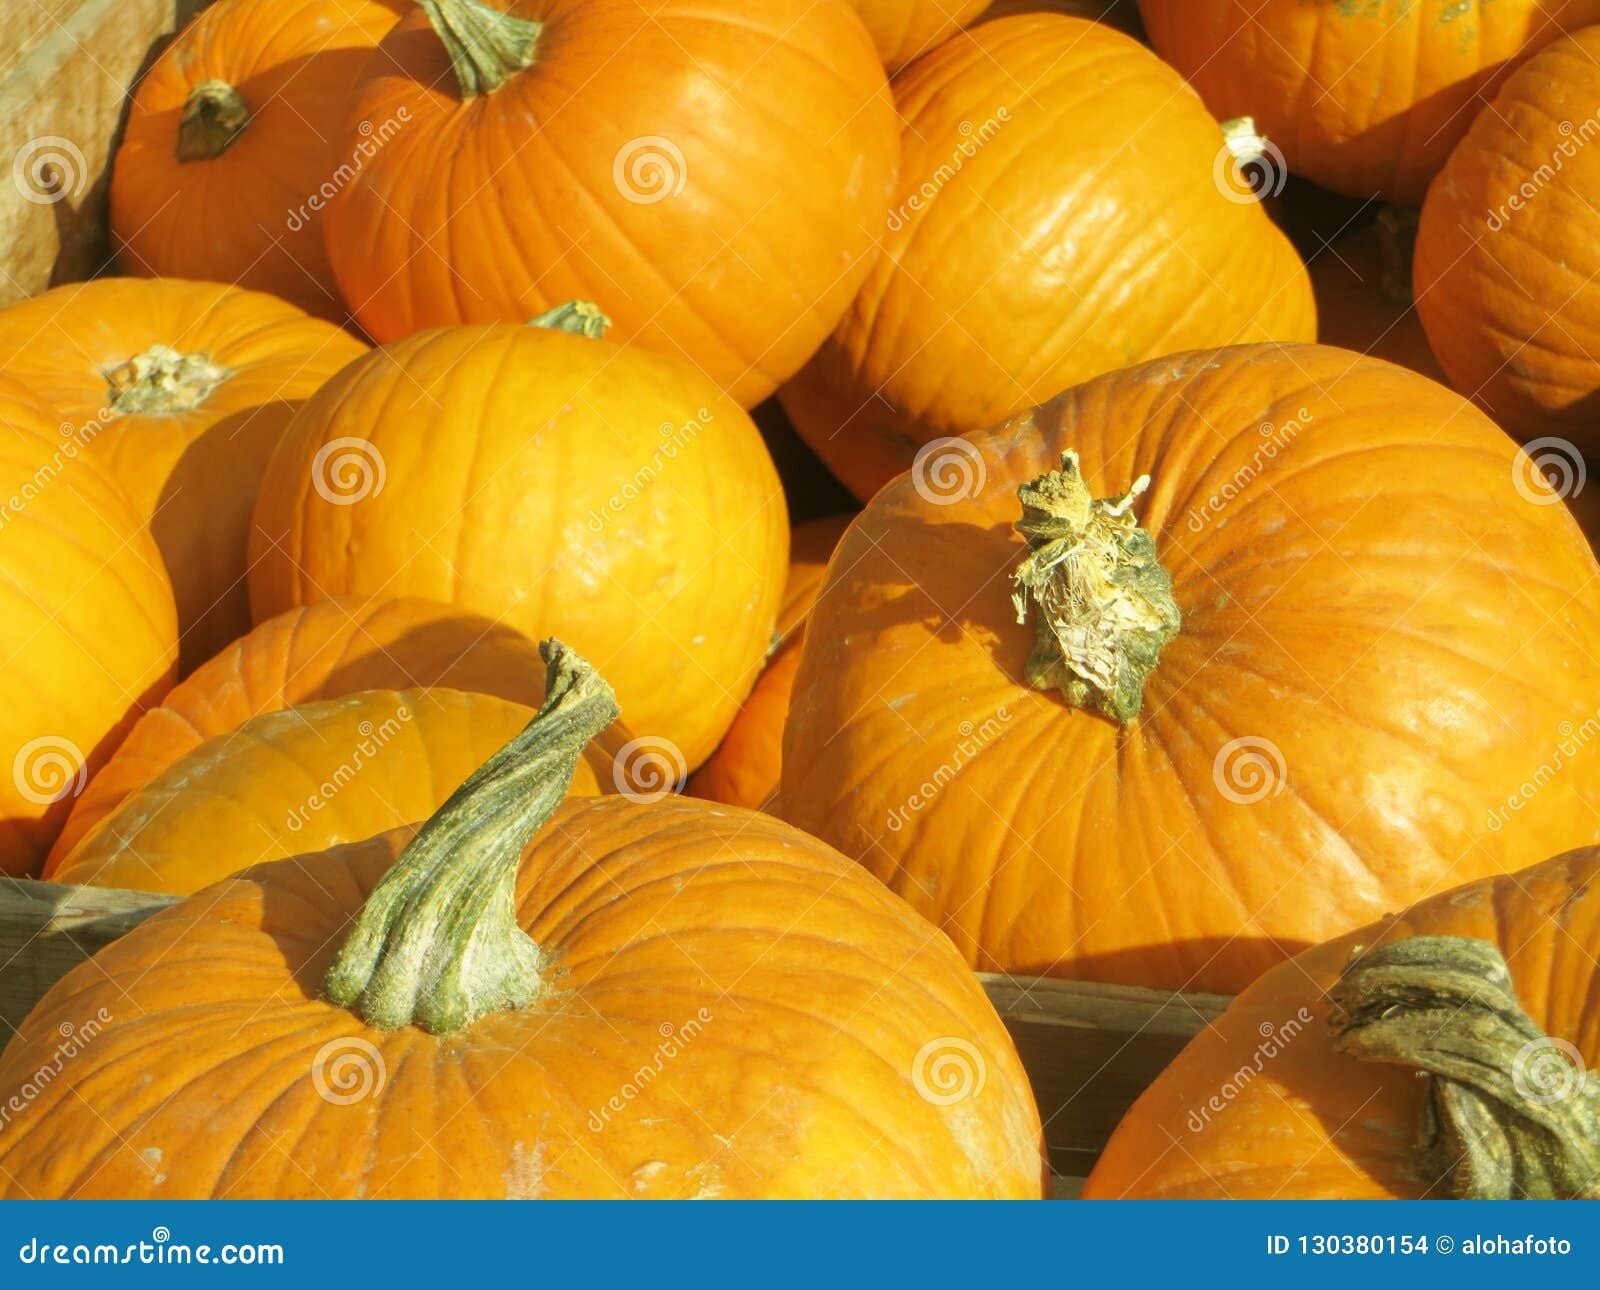 Wonderful golden yellow orange pumpkins on a happy sunny day